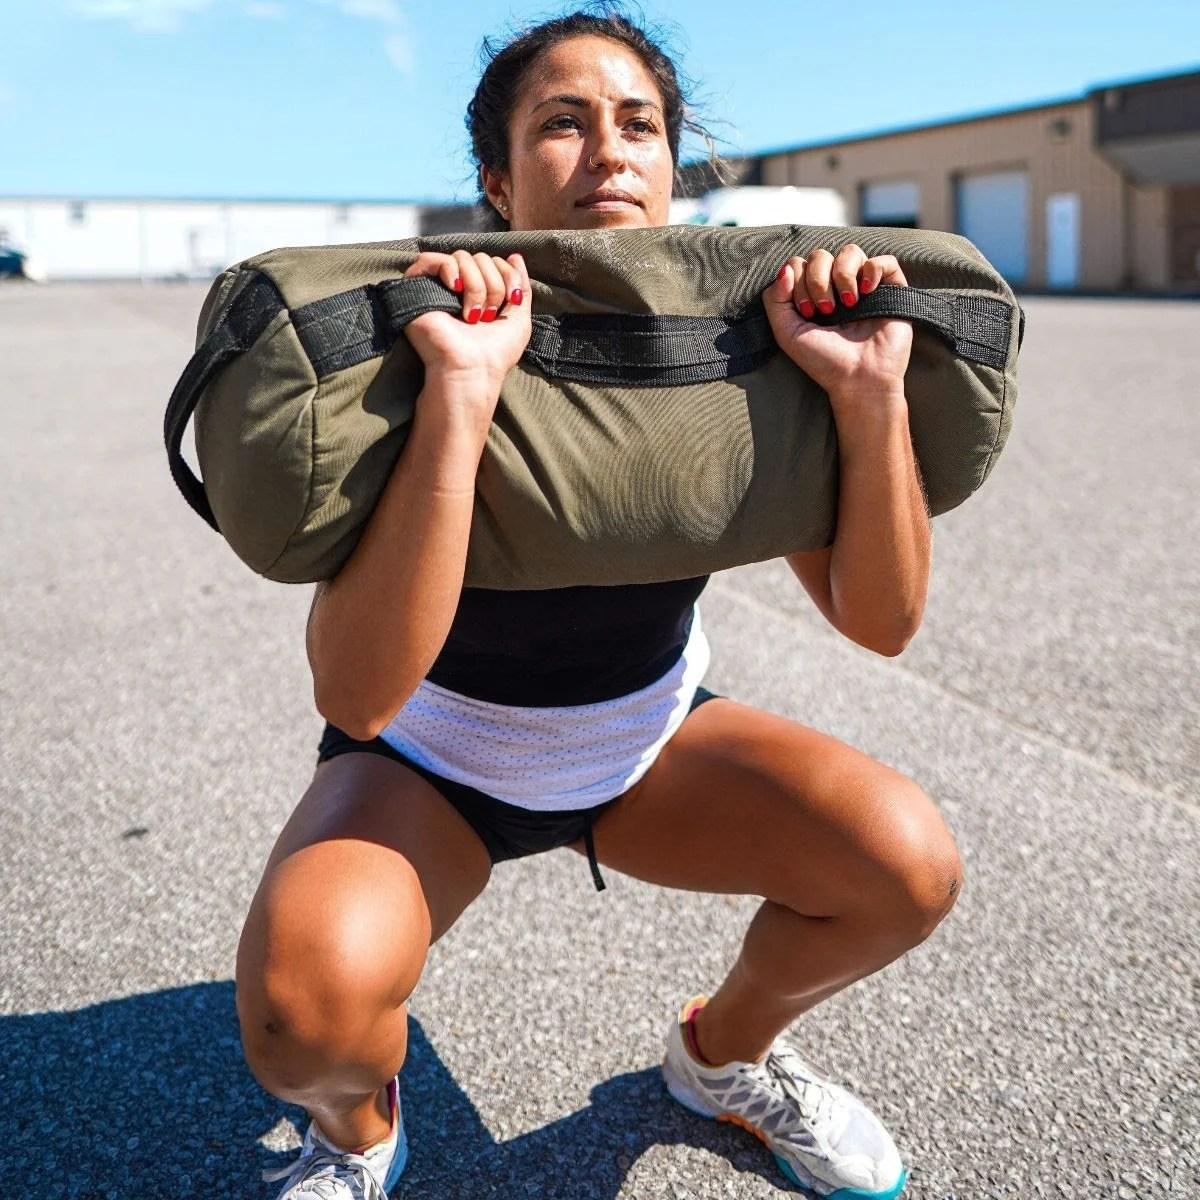 athlete-squat-sandbag